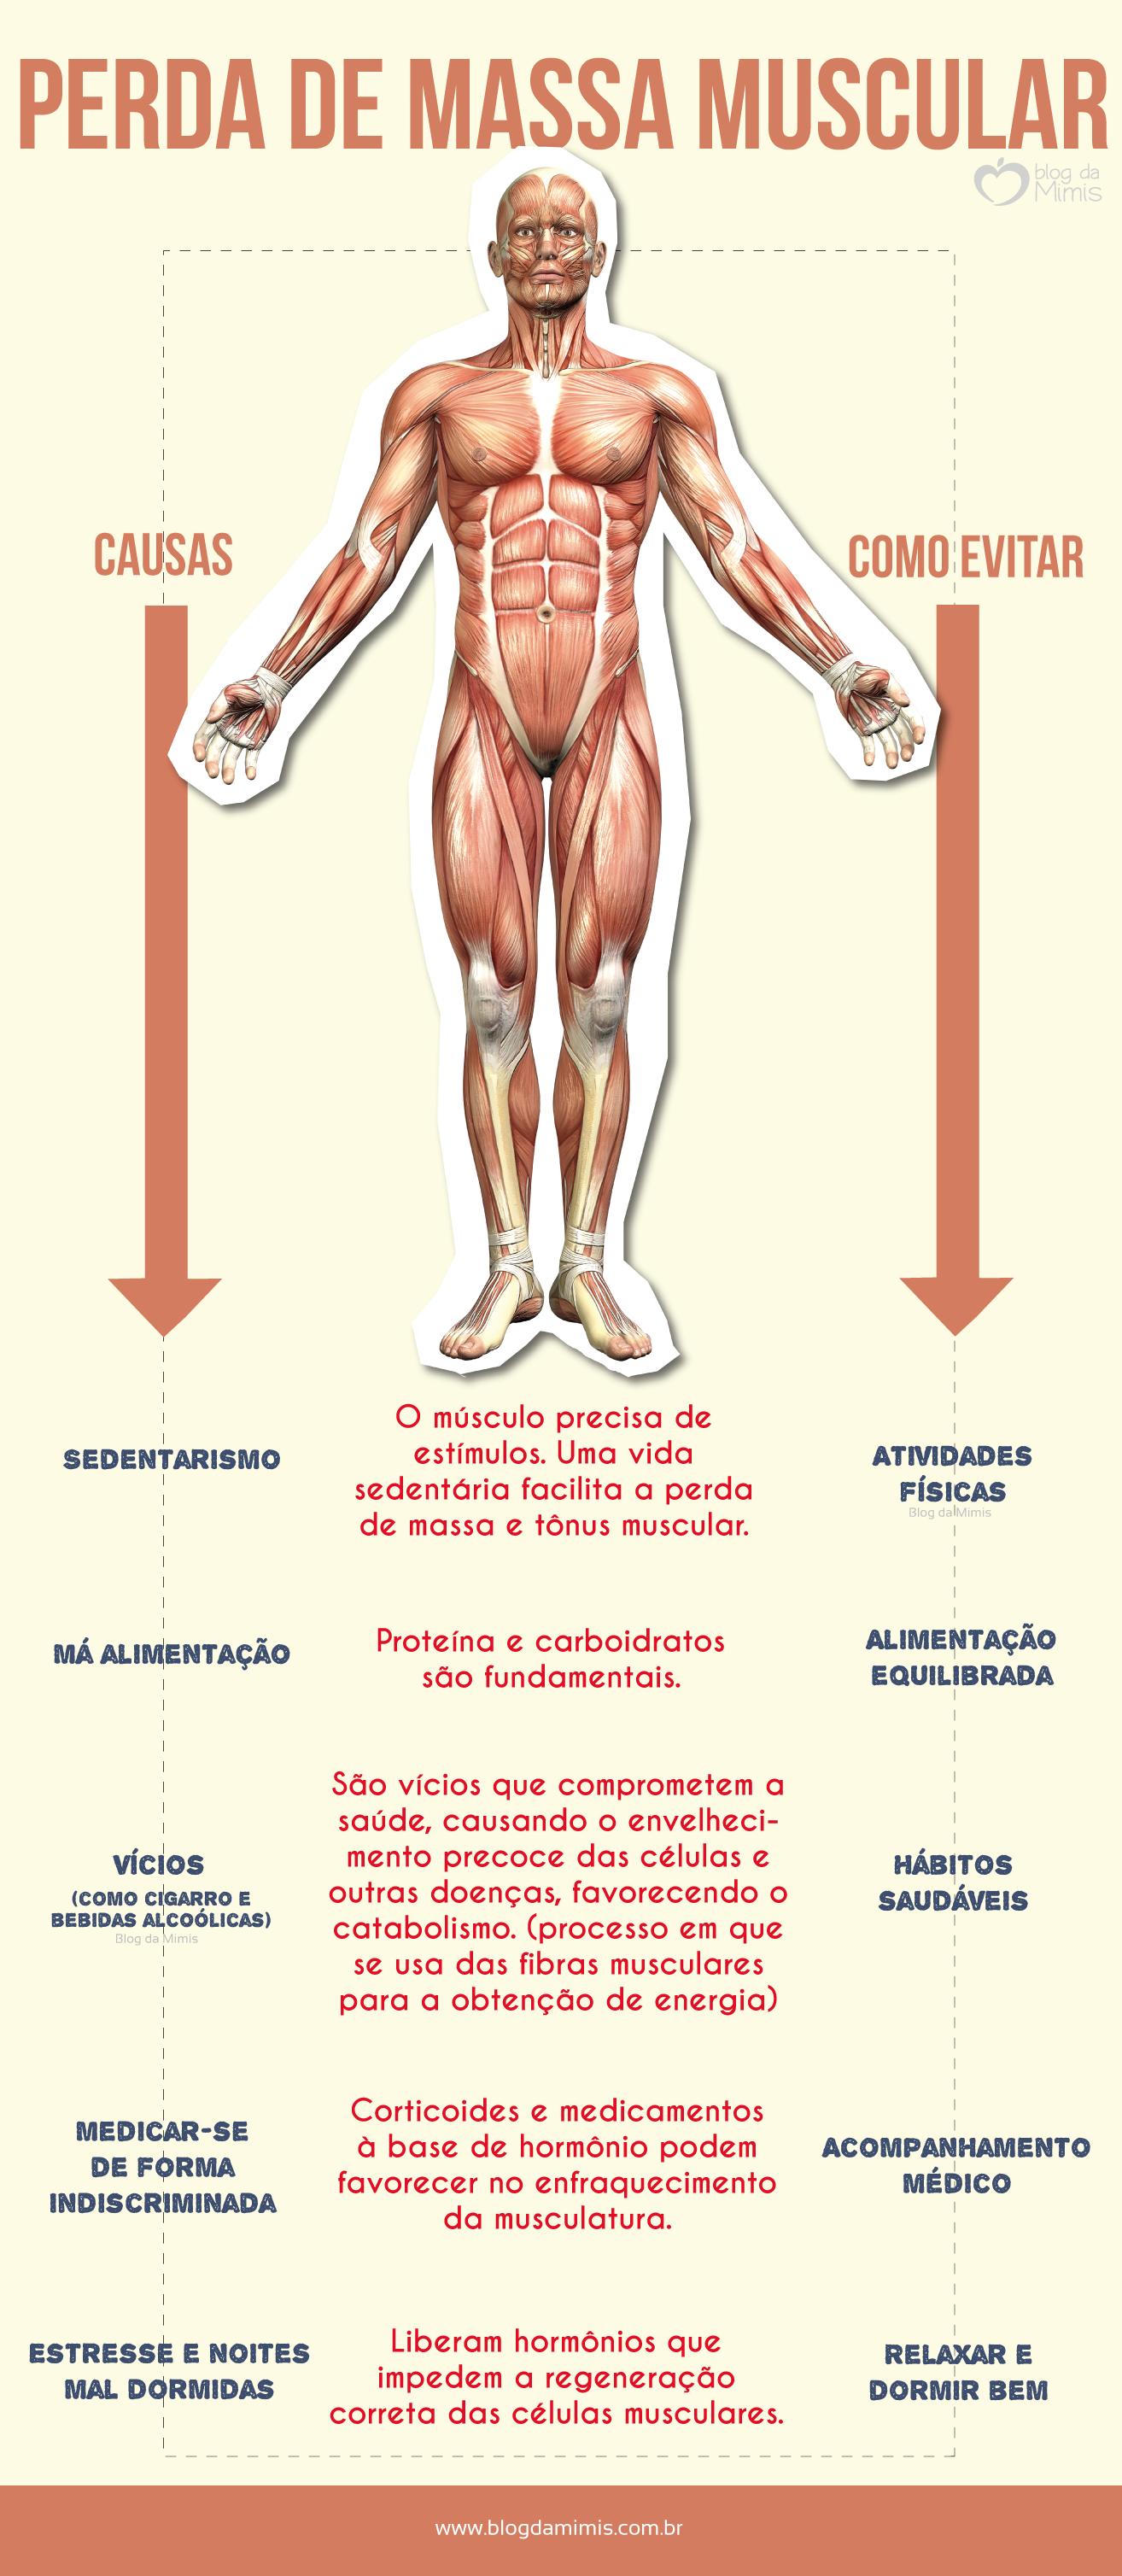 b48a6d1ce Perda de massa muscular  causas e como evitar - Blog da Mimis  blogdamimis   massamuscular  músculo  massamagra  emagrecer  saúde  academia  body